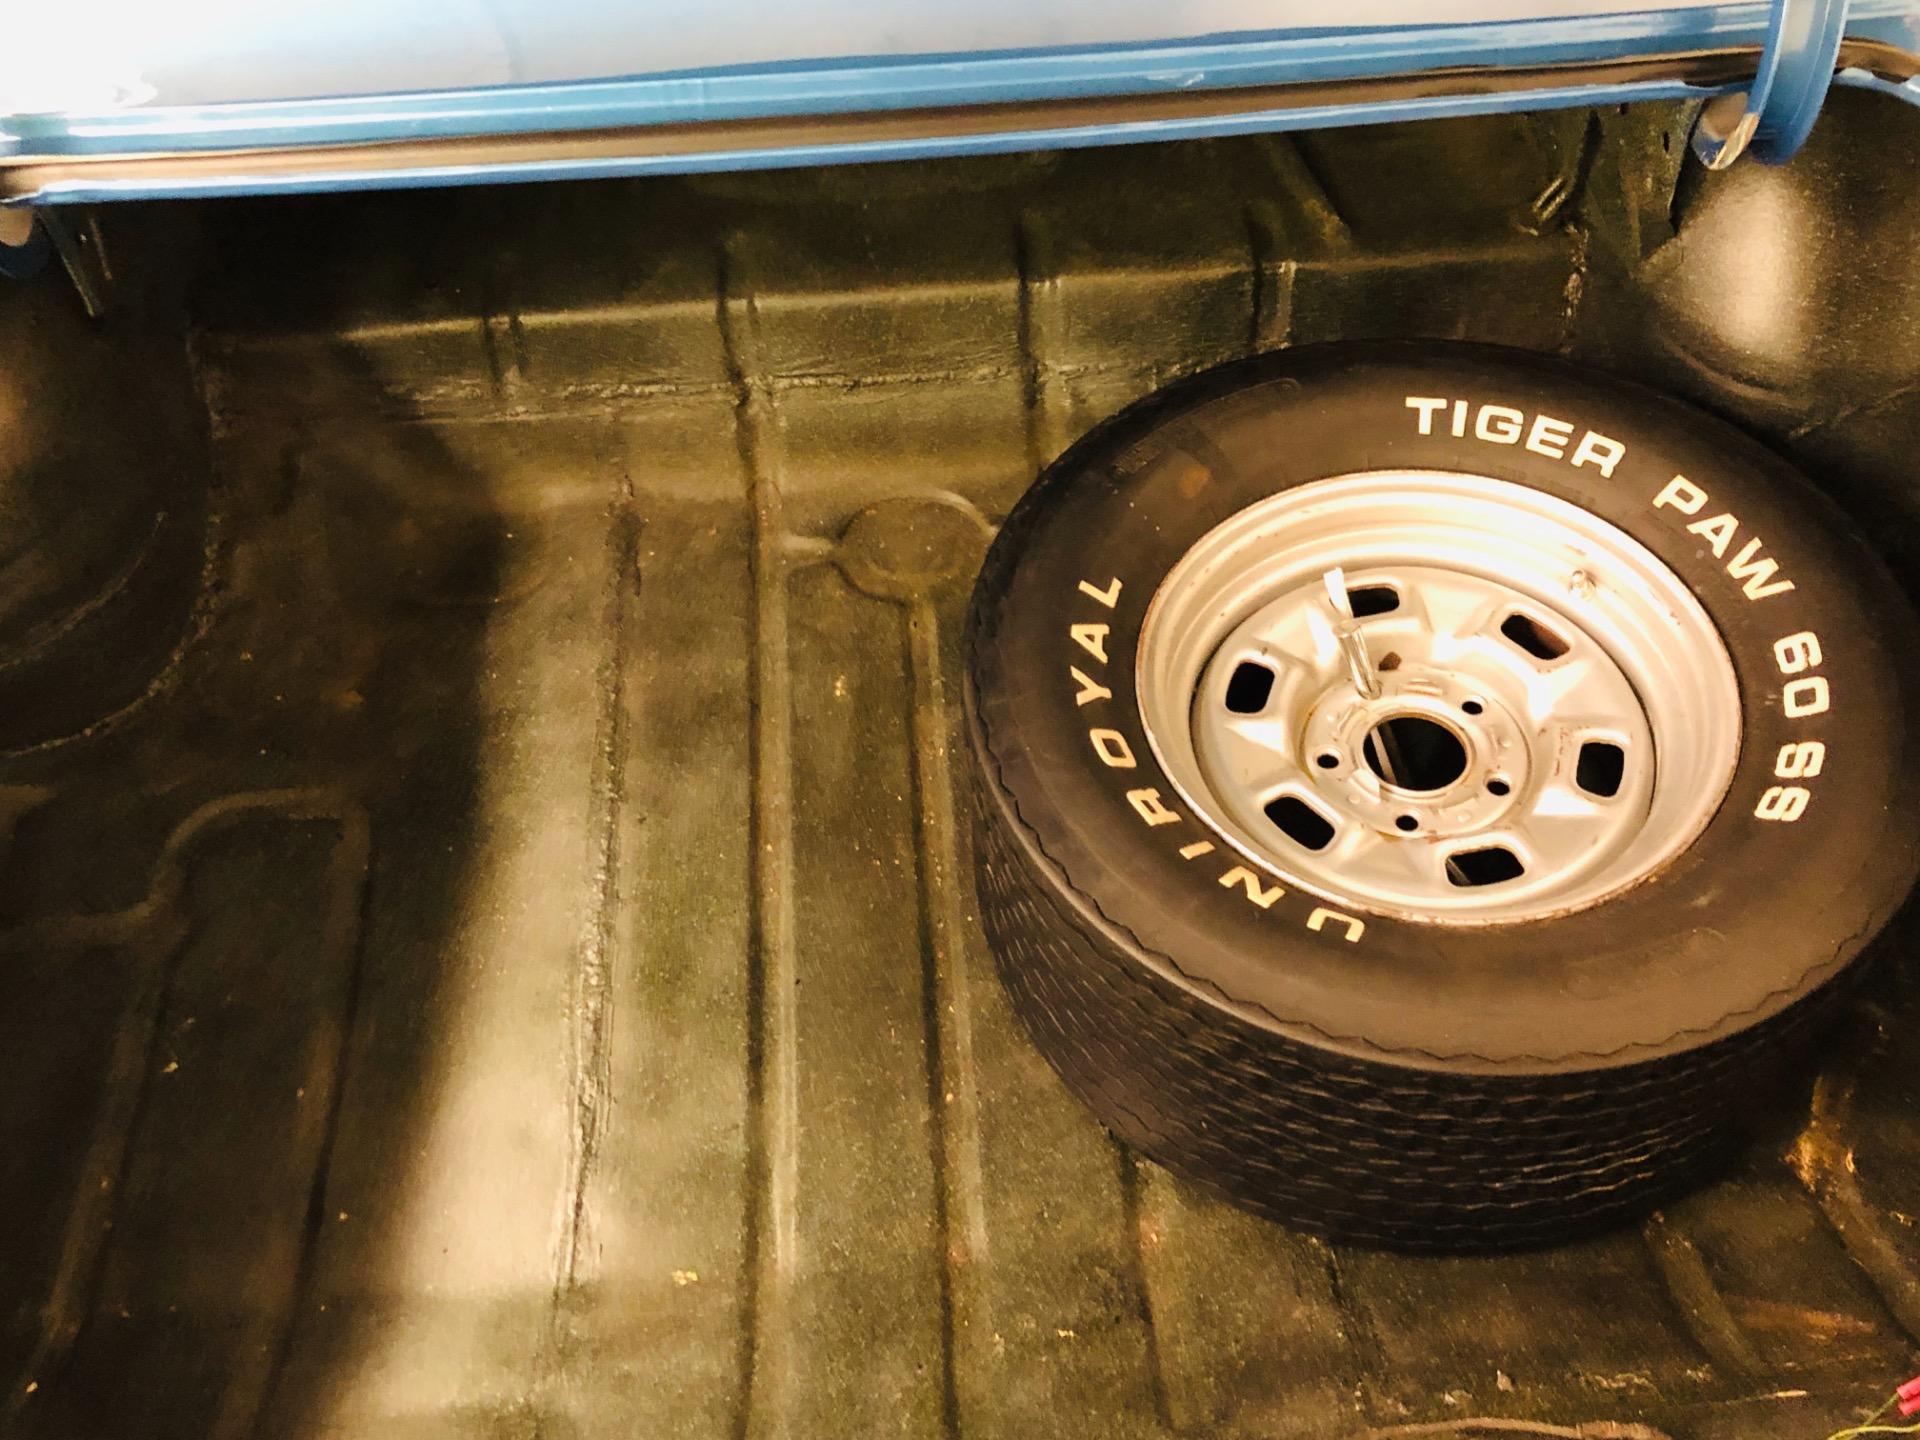 Used 1966 Chevrolet Chevelle - 300 DELUXE SEDAN - 350 V8 ENGINE - SEE VIDEO | Mundelein, IL